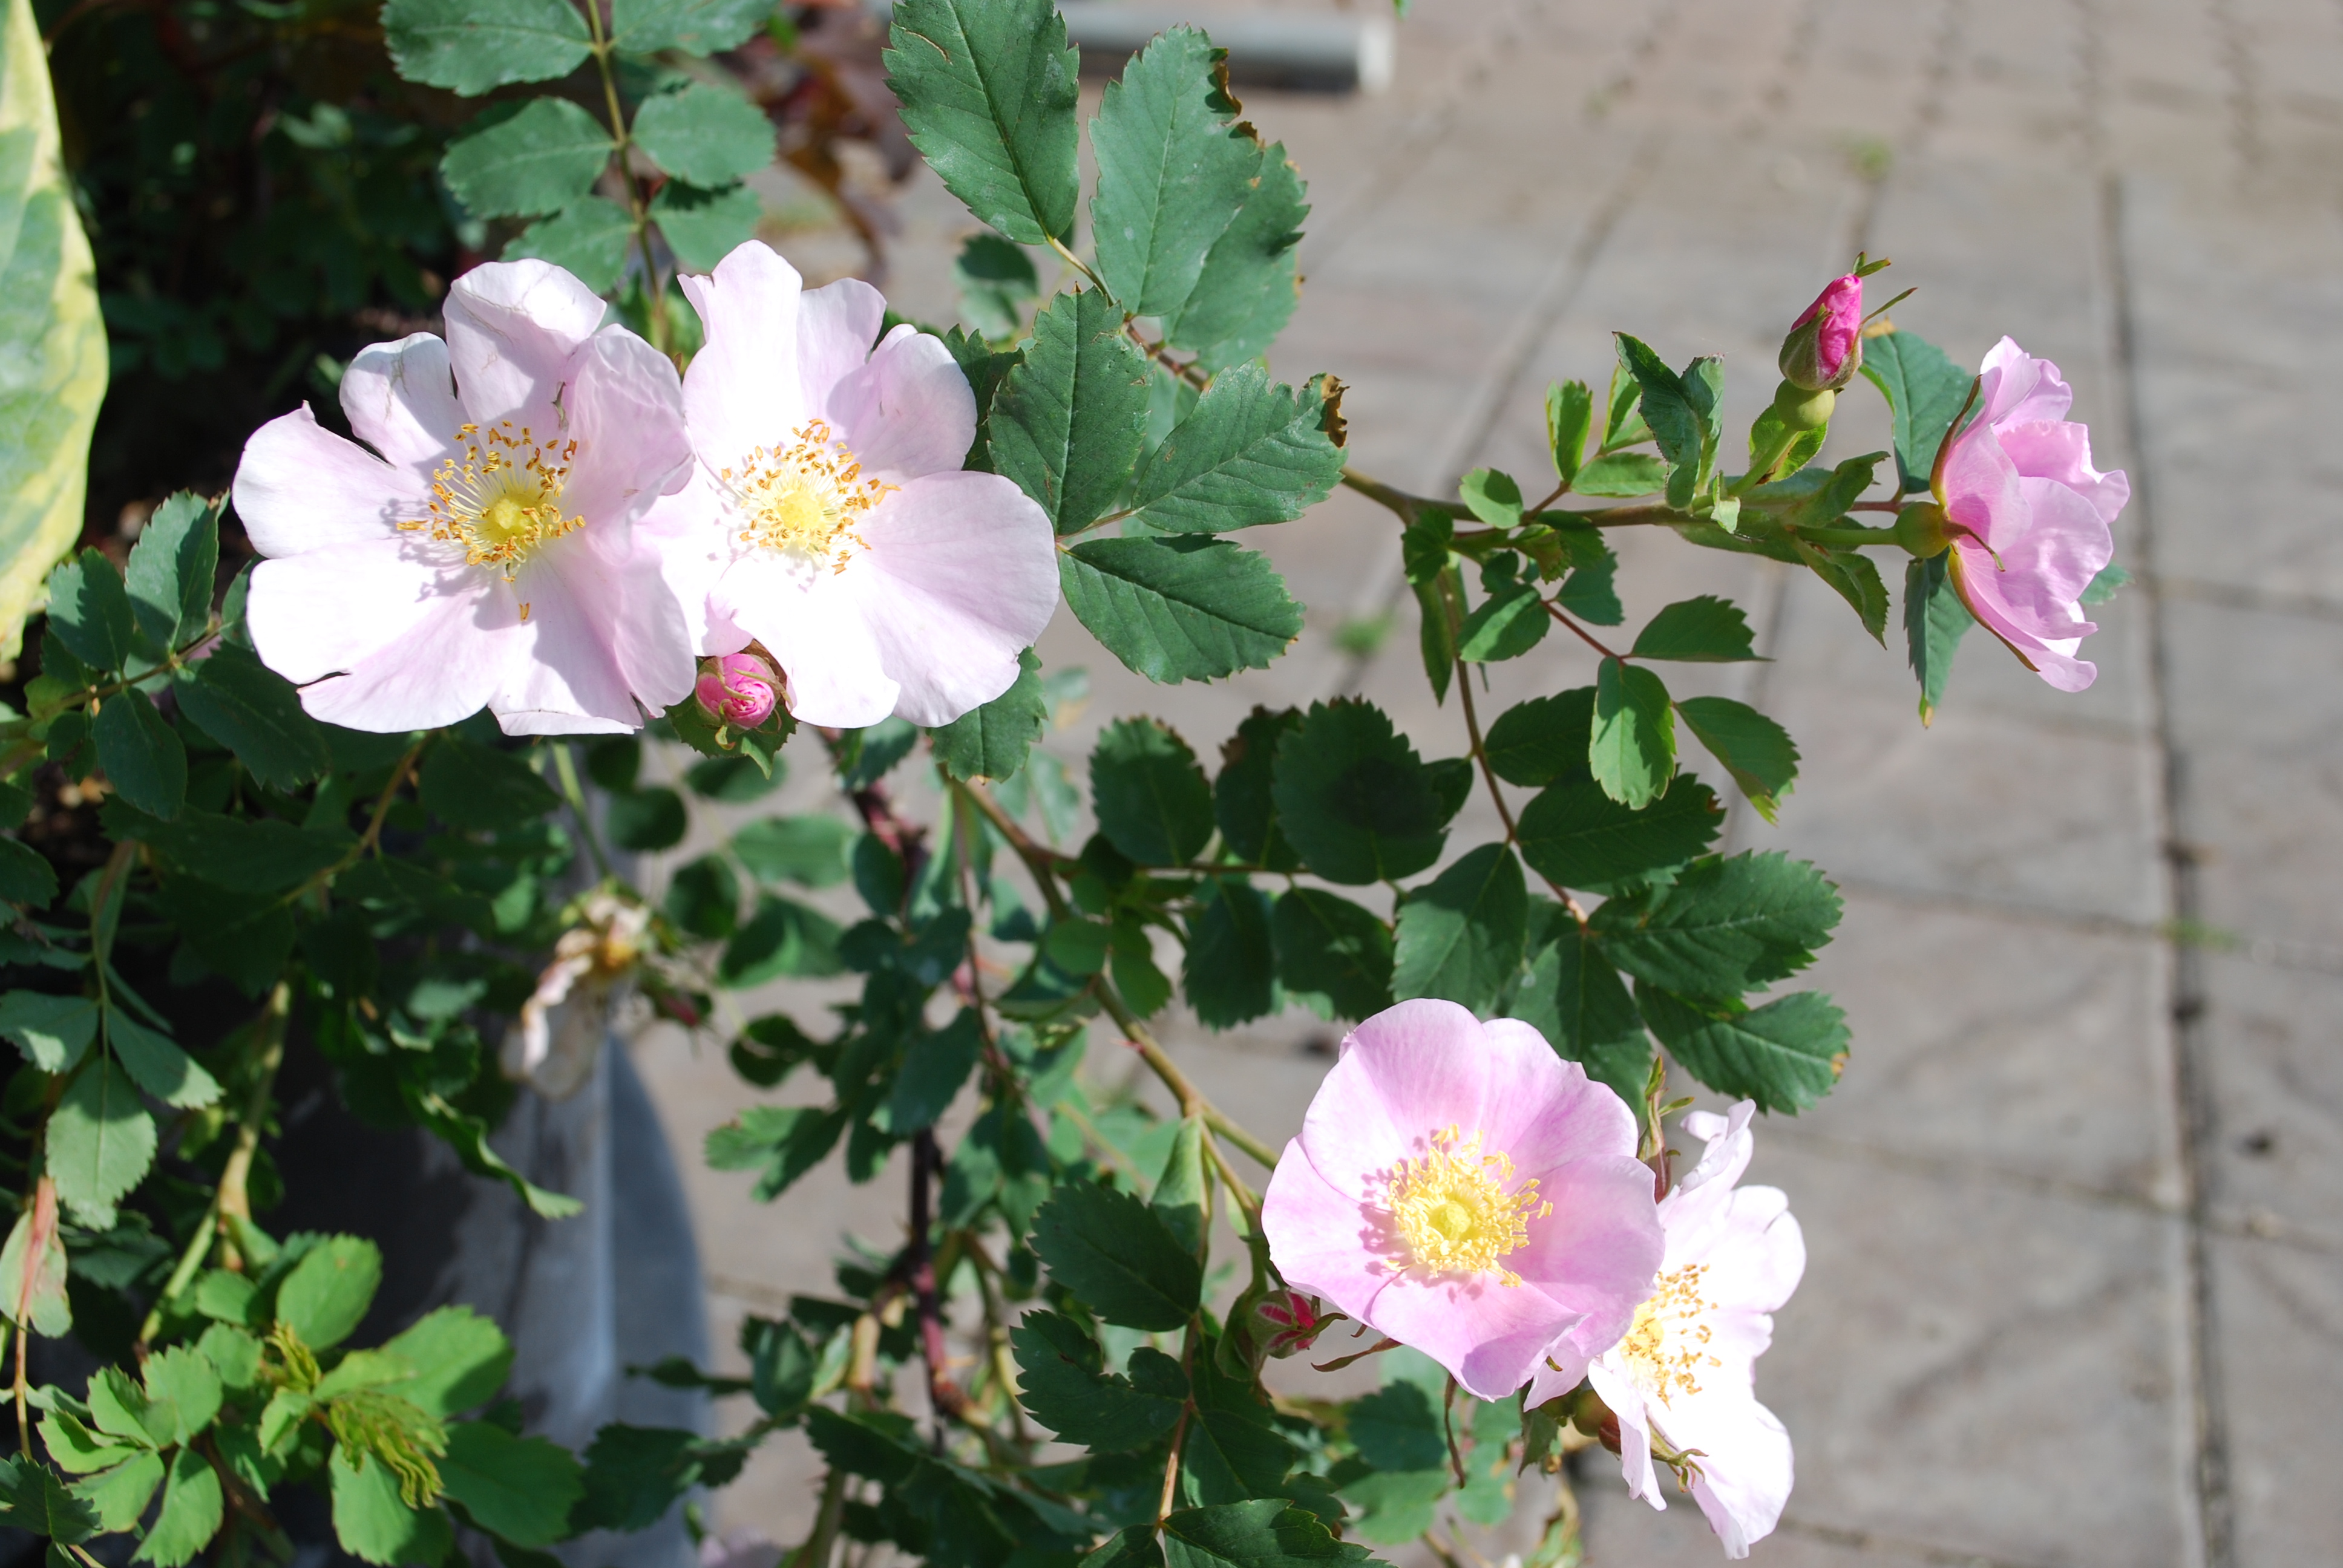 Prickly Rose in Flower